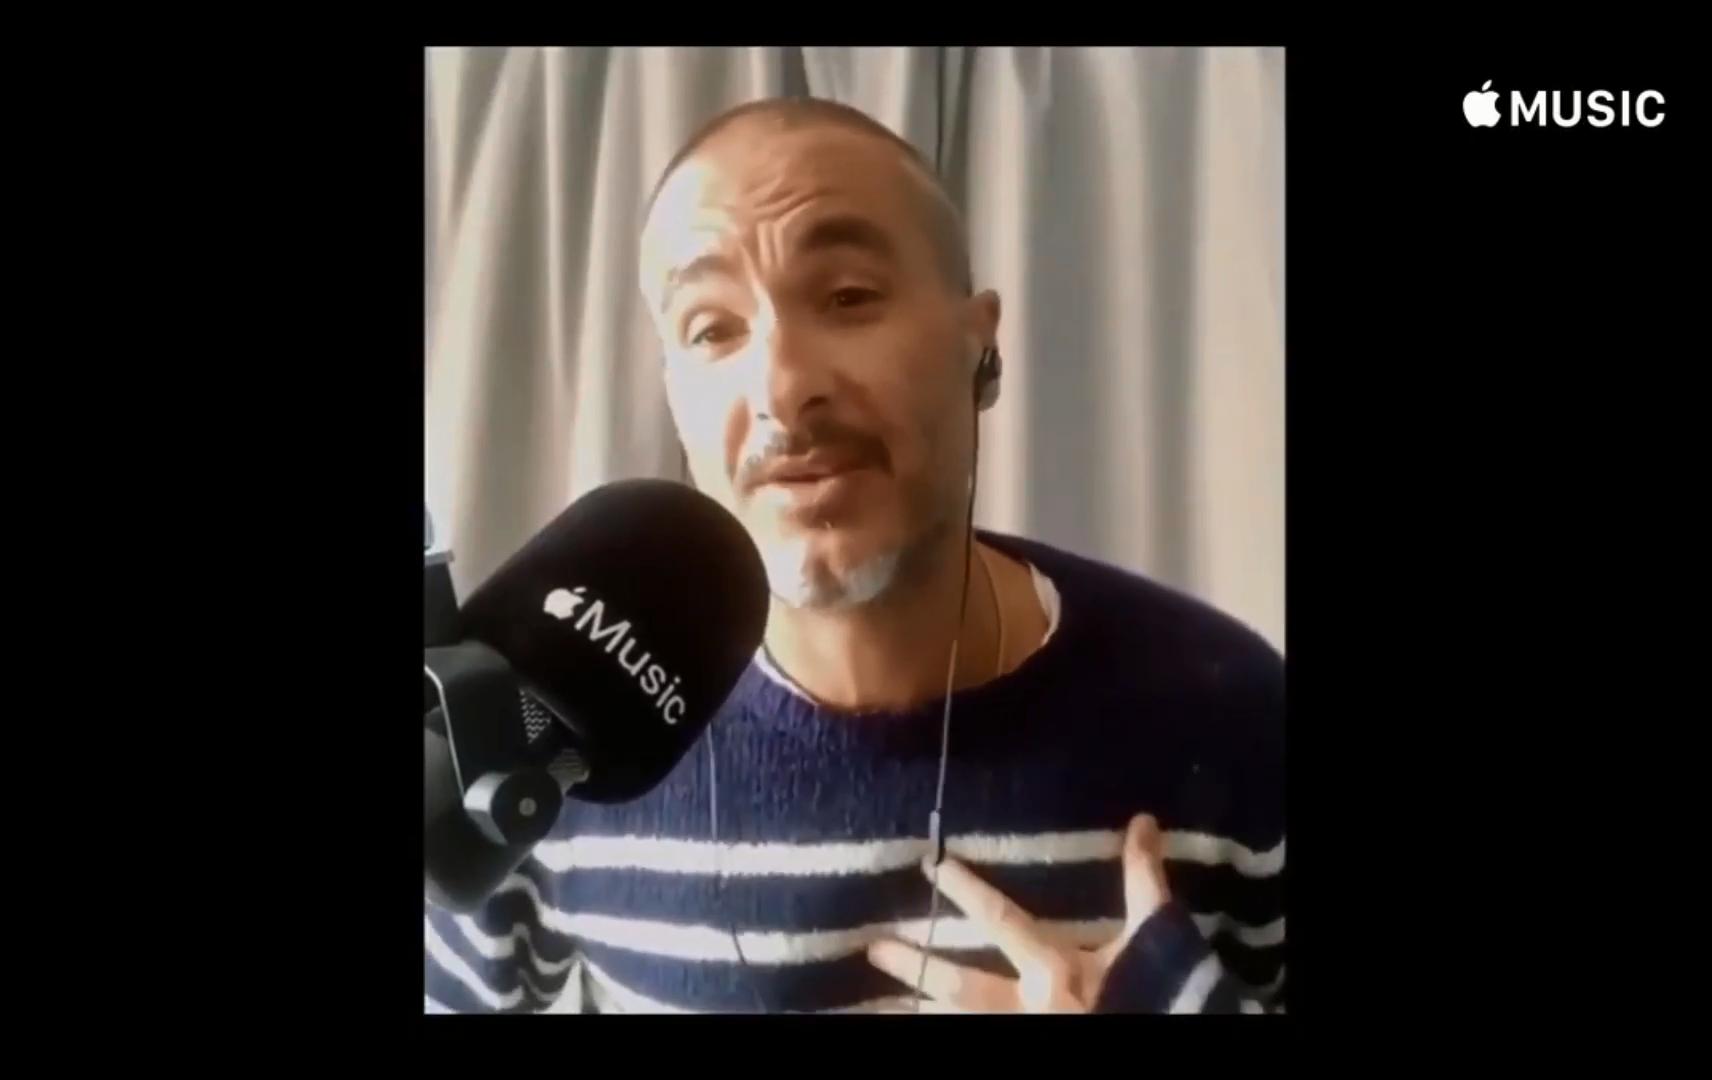 BLACKPINK Interview with Zane Lowe Apple Music - Full 9-4 screenshot